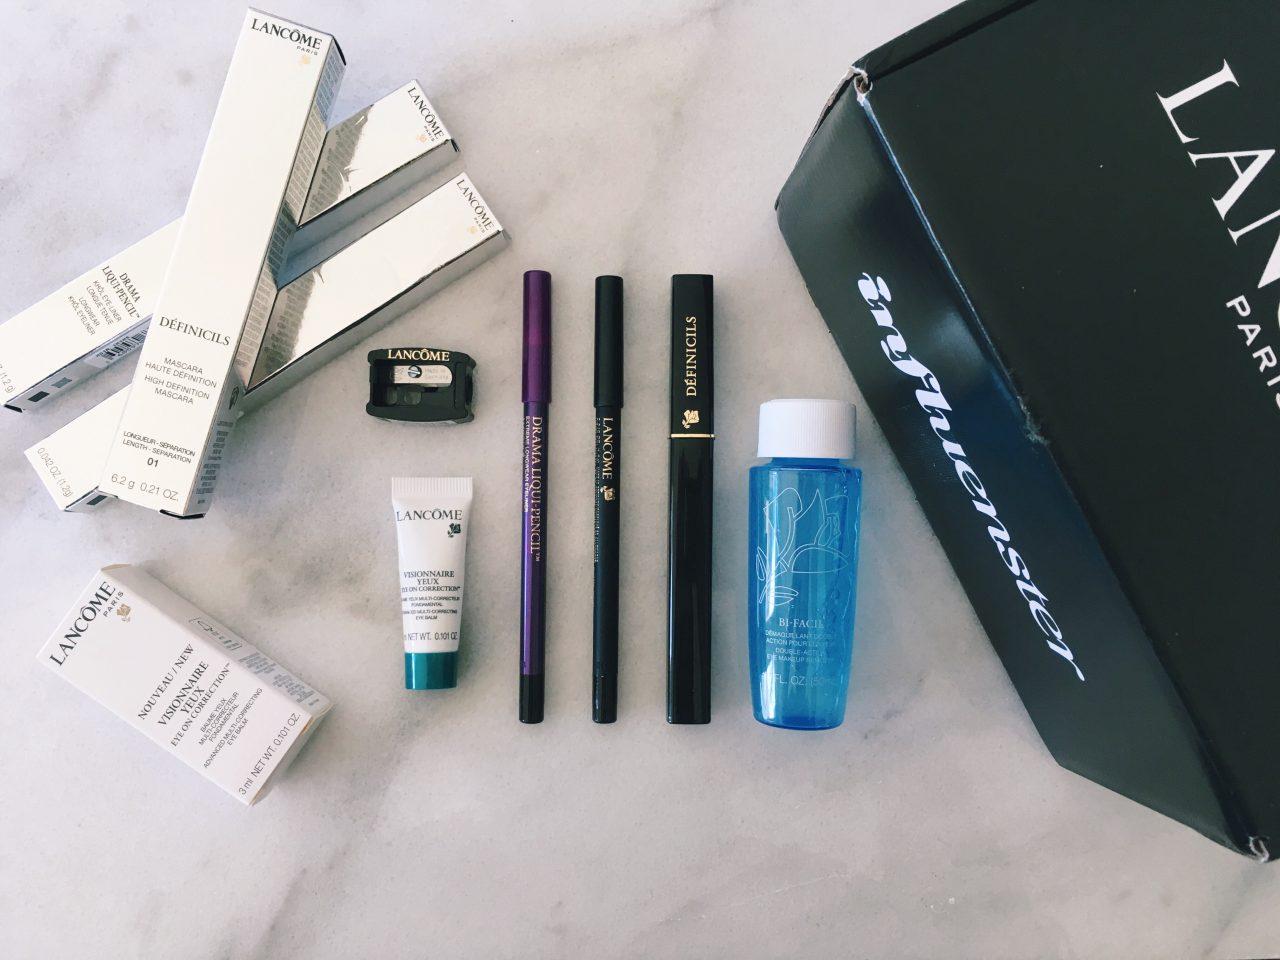 Influenster Lancome VoxBox, Lancome Drama Liqui-Pencil and Definicils Mascara Review, Easy Subtle Purple Eyeliner Look